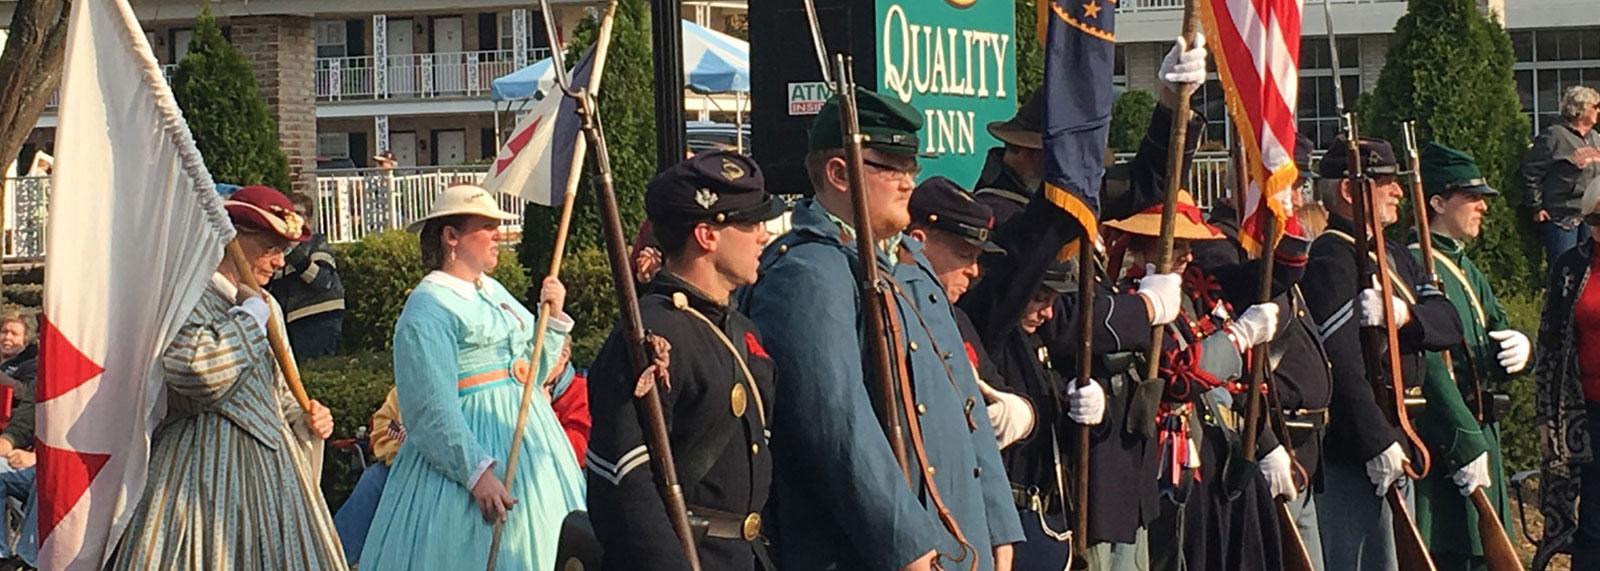 Holiday Special in Quality Inn Gettysburg Battlefield